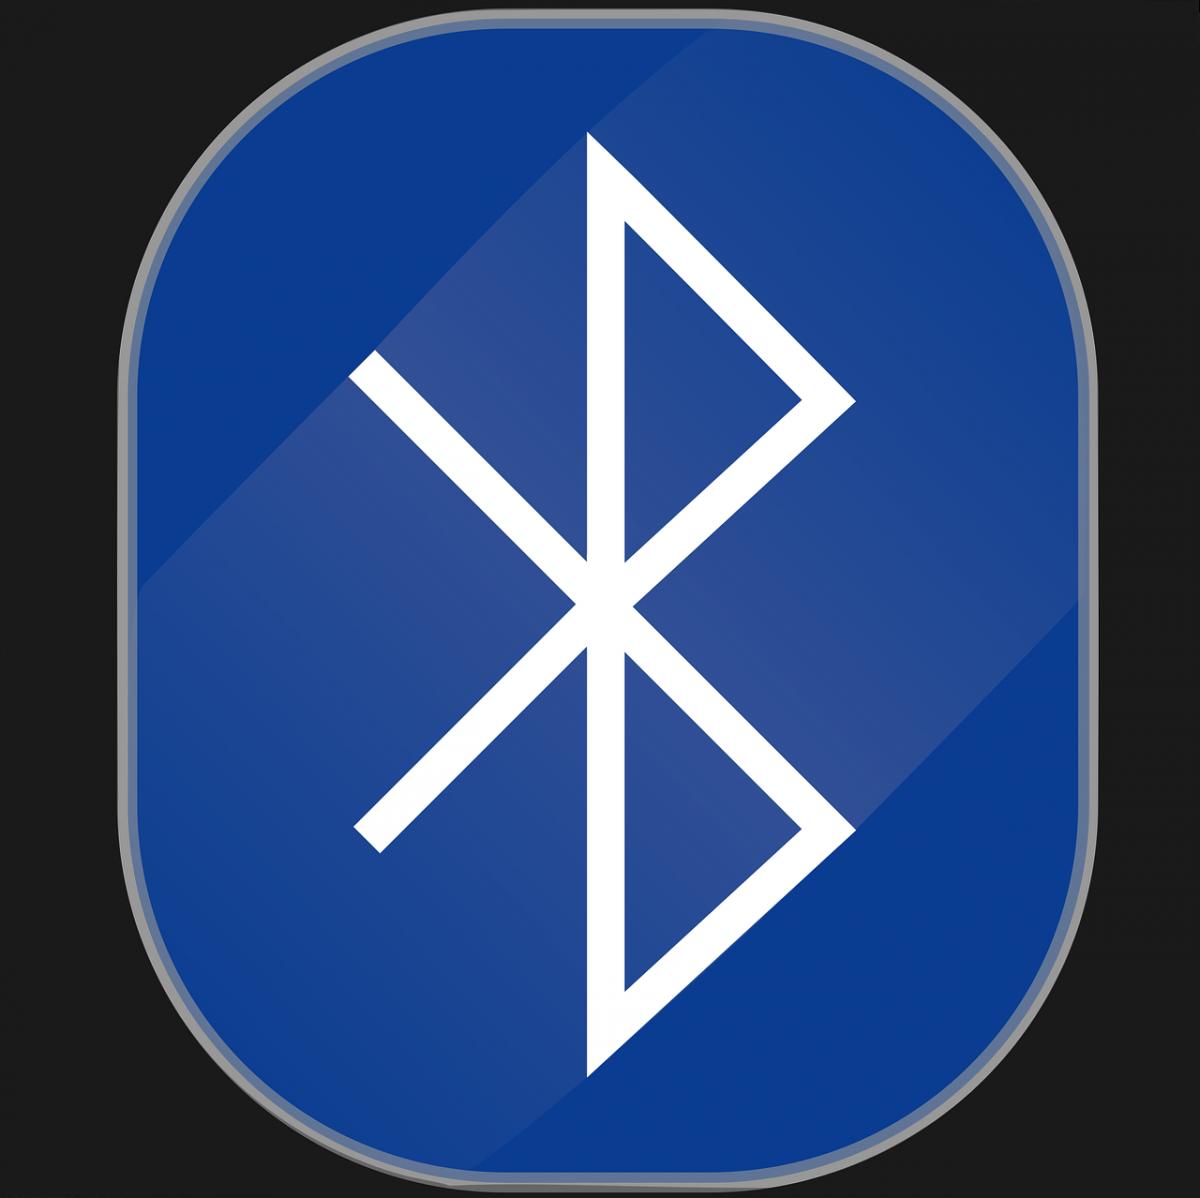 El bonito logo del Bluetooth